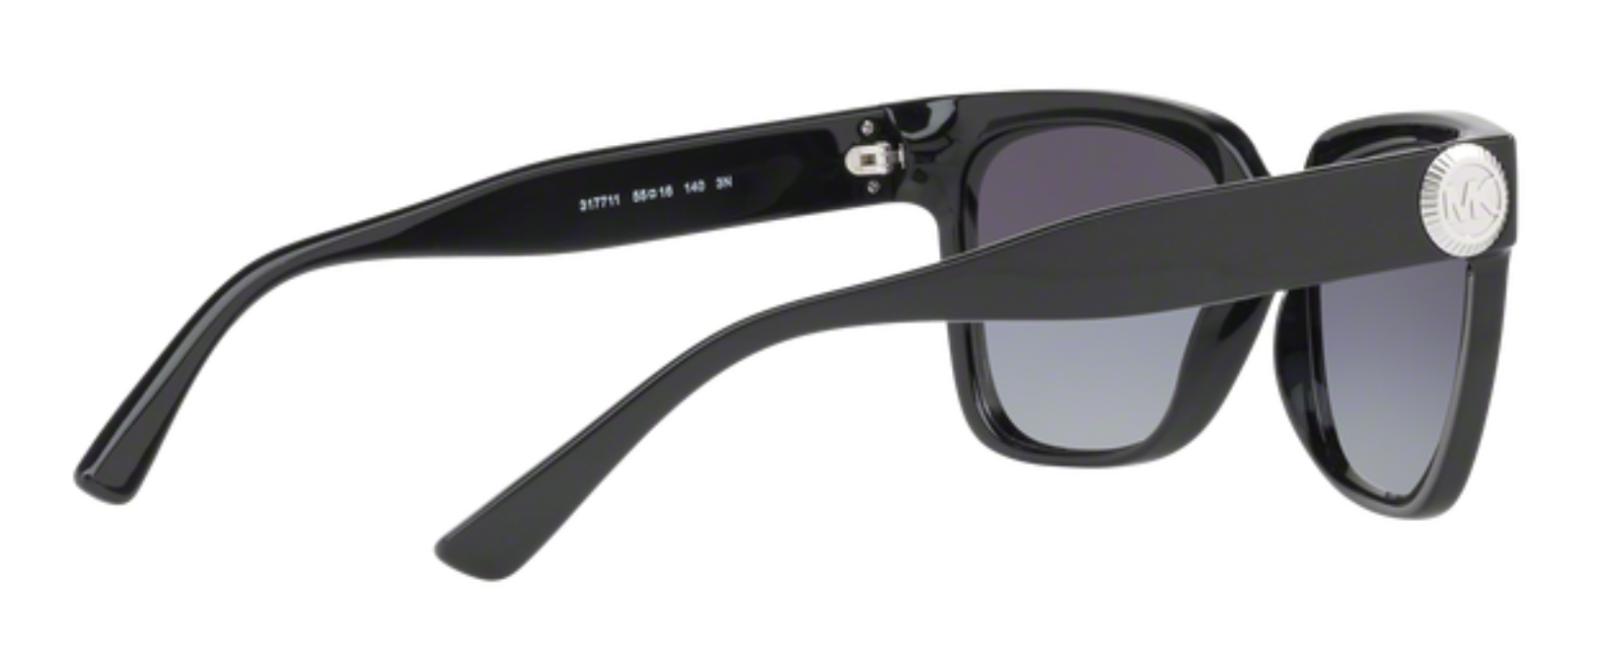 900525201f148 Sunglasses Michael Kors MK 2054 Ena 317711 Sunglasses 3177 11 Sonnenbrill  for sale online